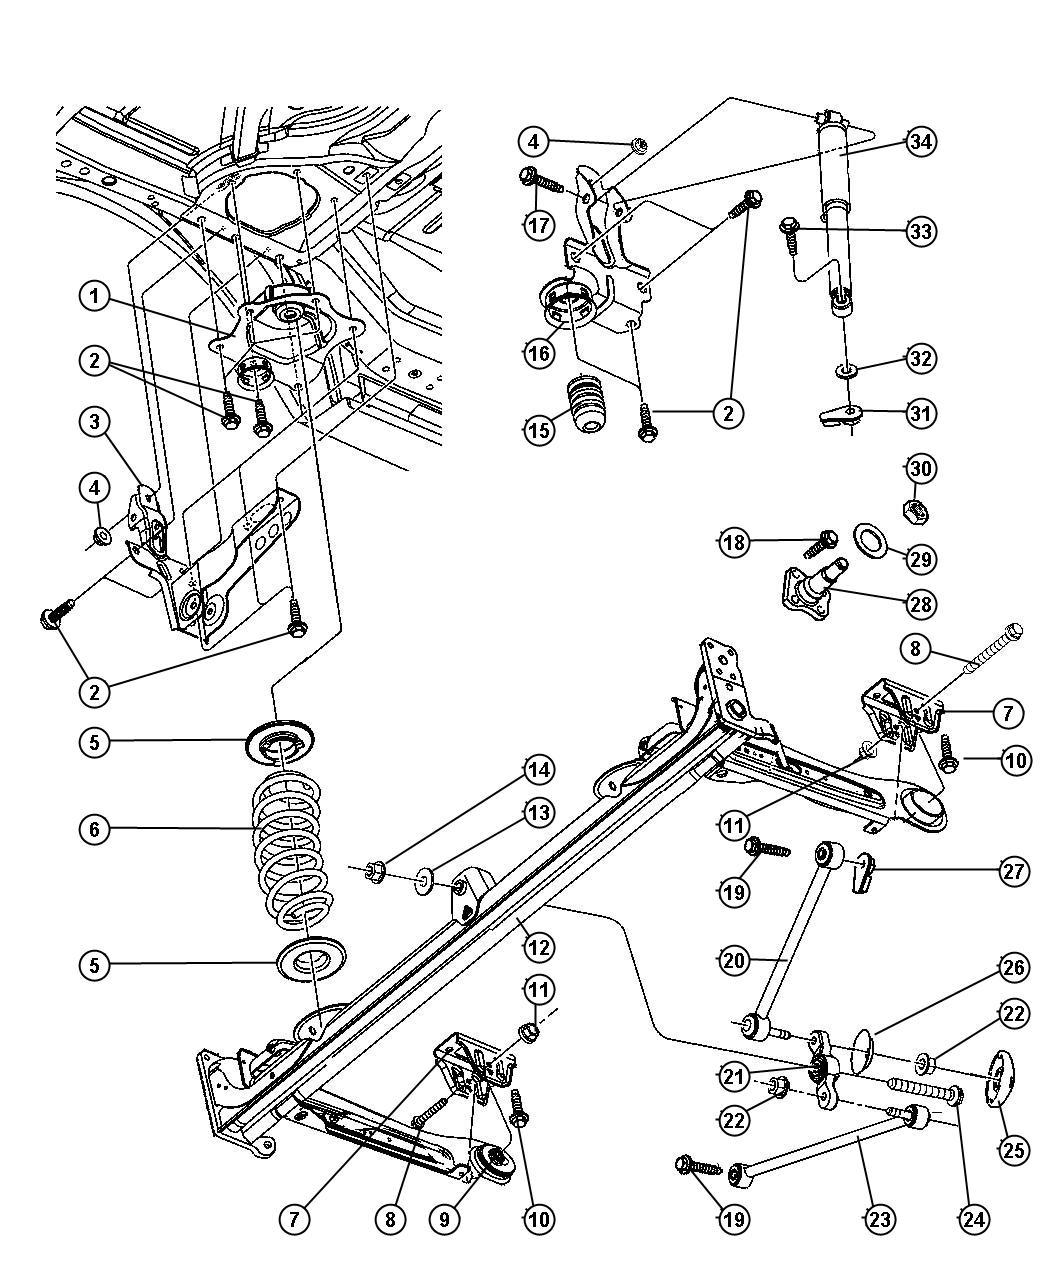 Dodge Durango Link. Sway eliminator, trackbar. Bell crank